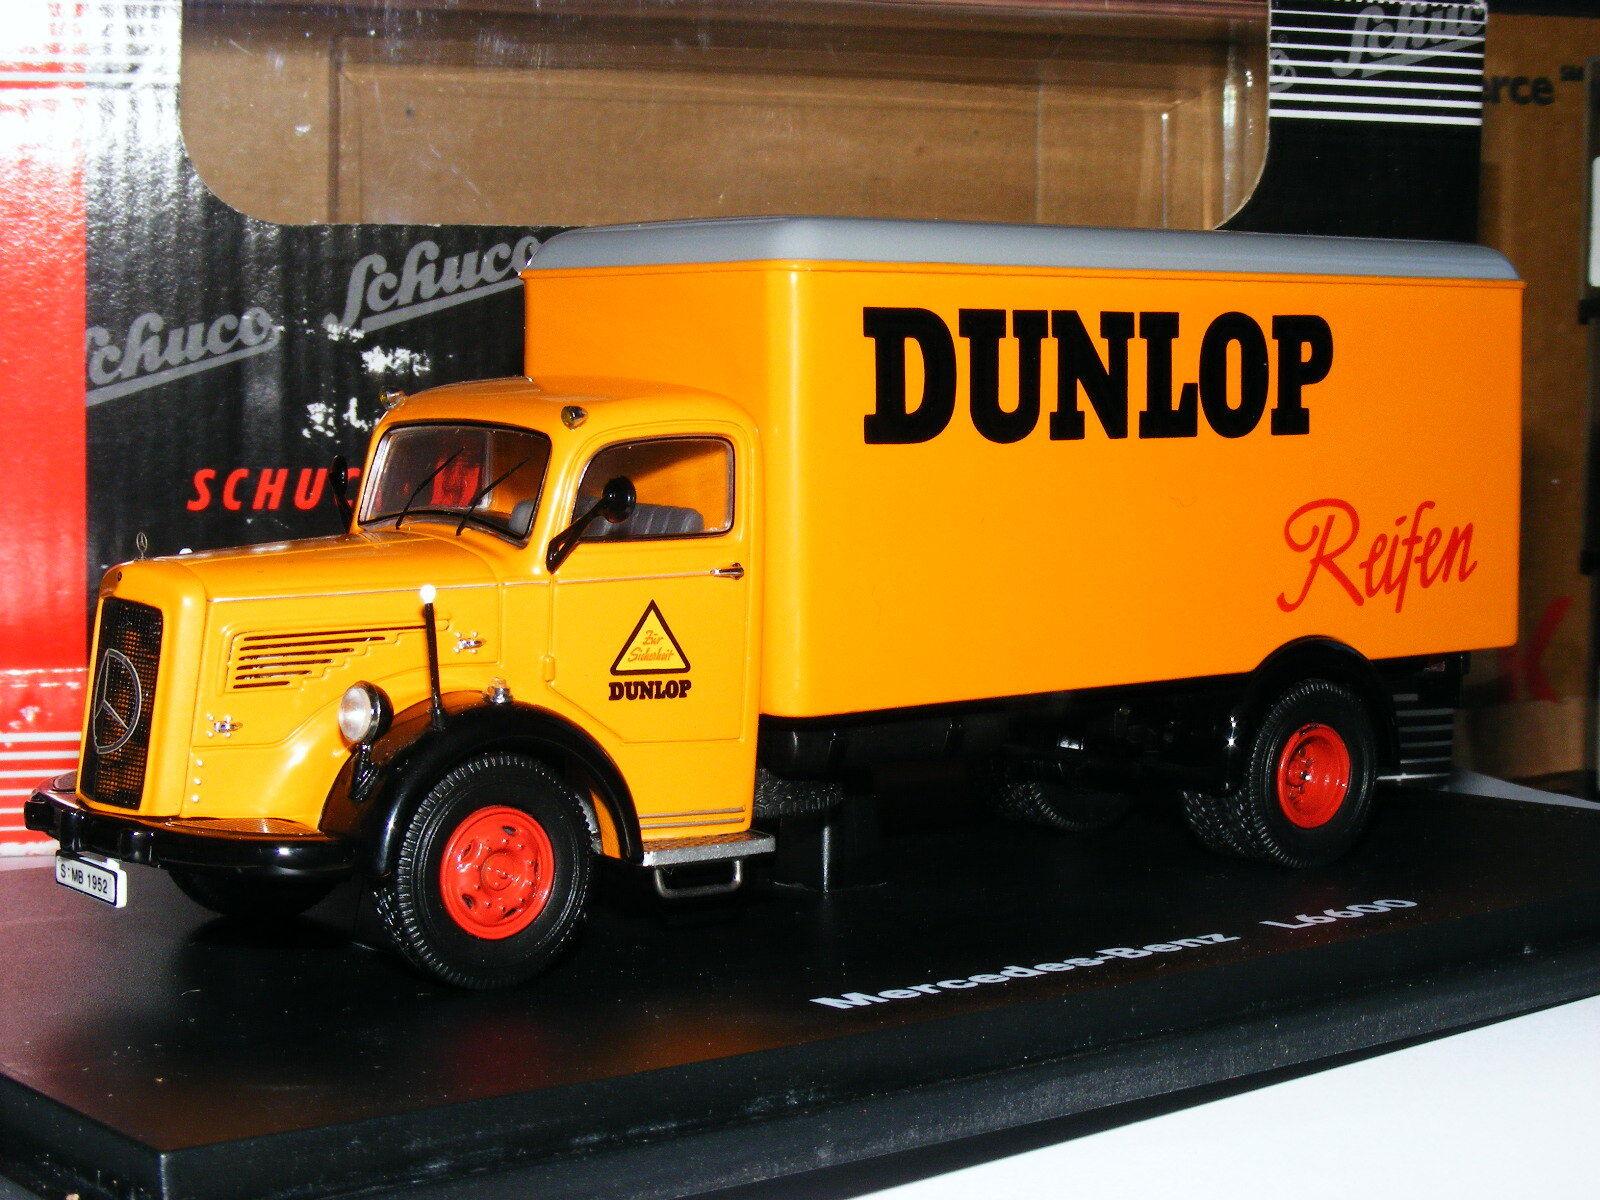 Schuco 03021 Mercedes-Benz L6600 Van Dunlop 1 43